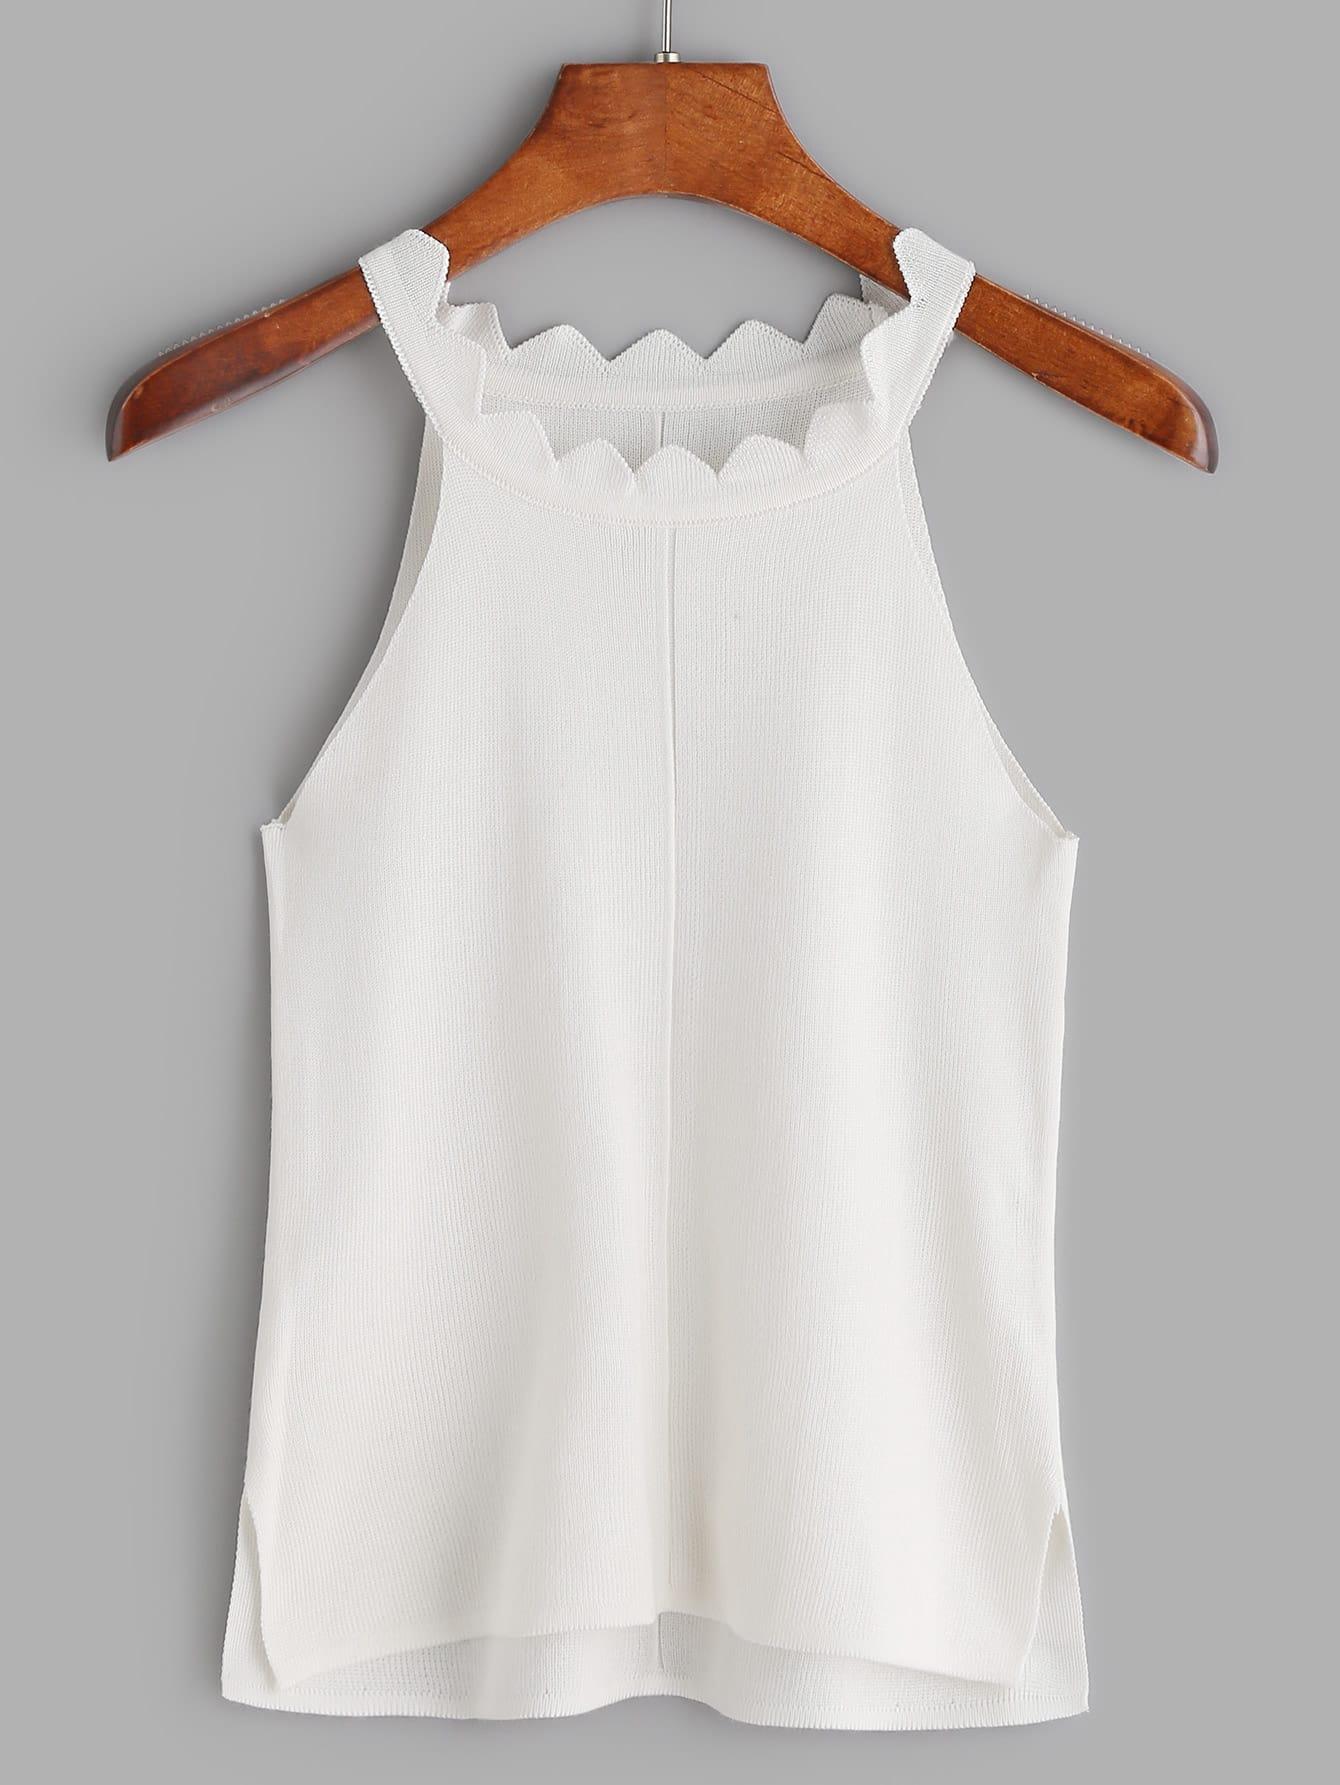 Фото White Knit Scallop Detail Slit Side Tank Top. Купить с доставкой